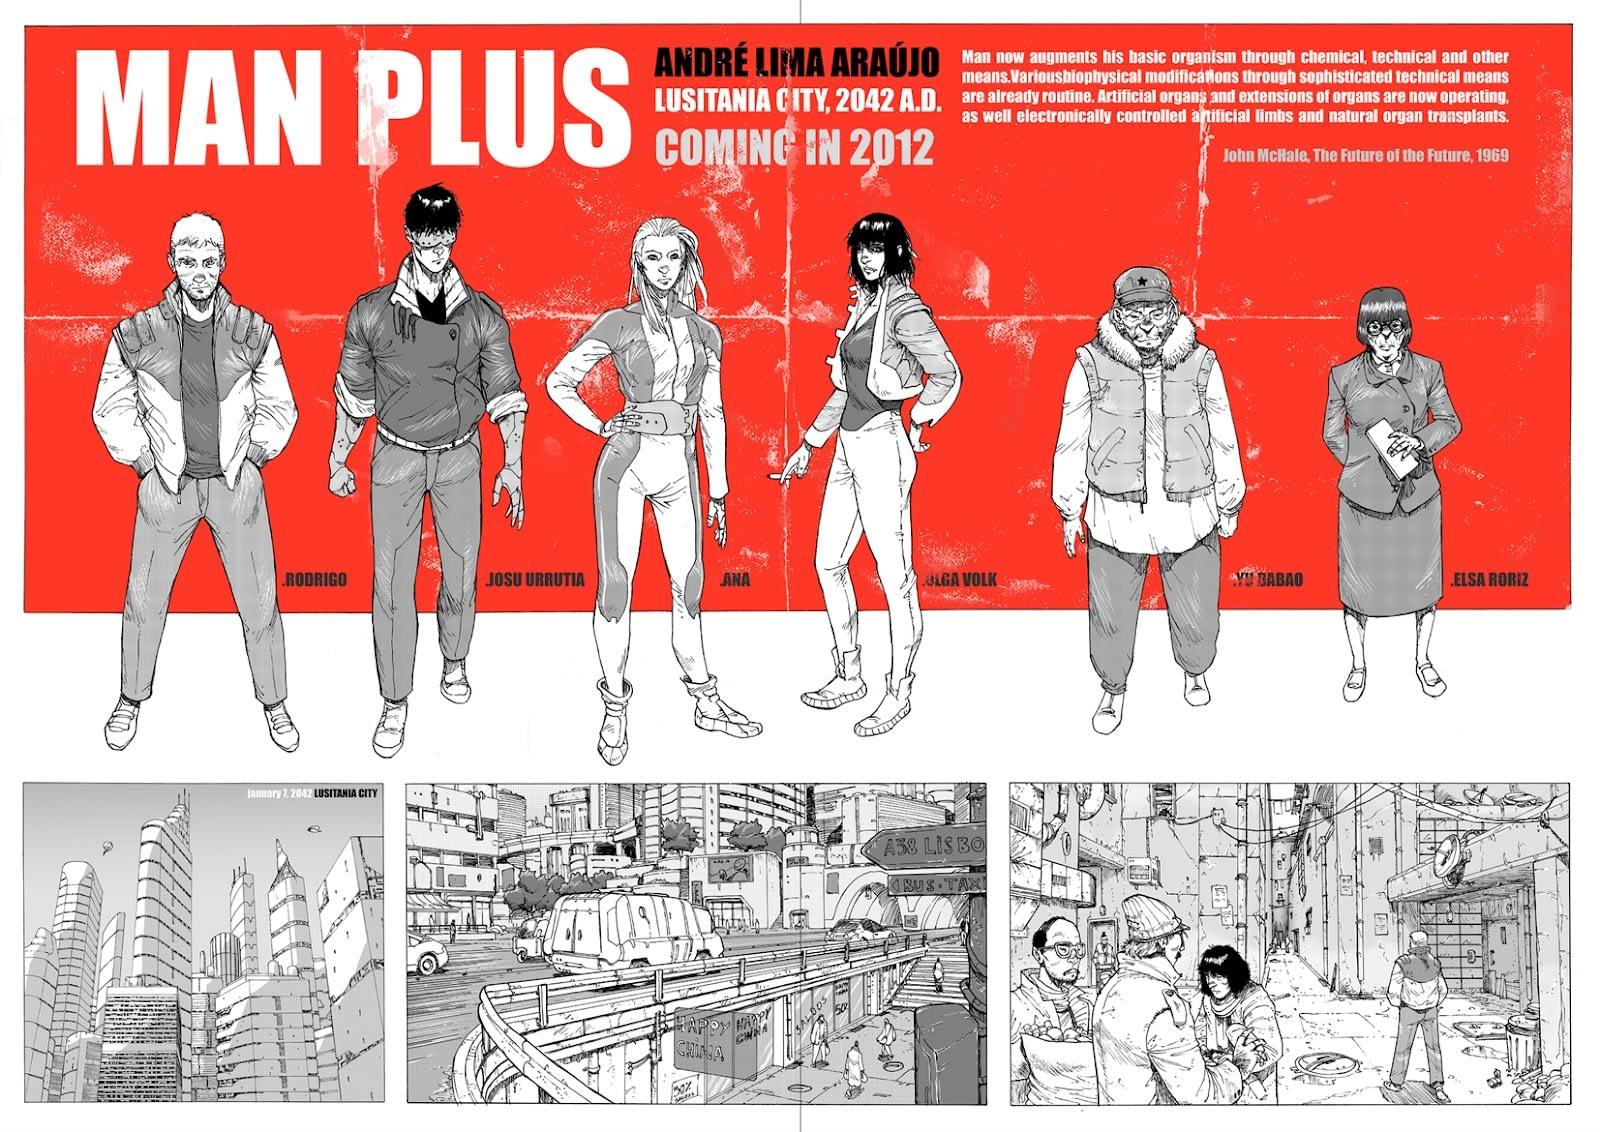 man_plus_team_poster_by_erdna1-d51mcbq